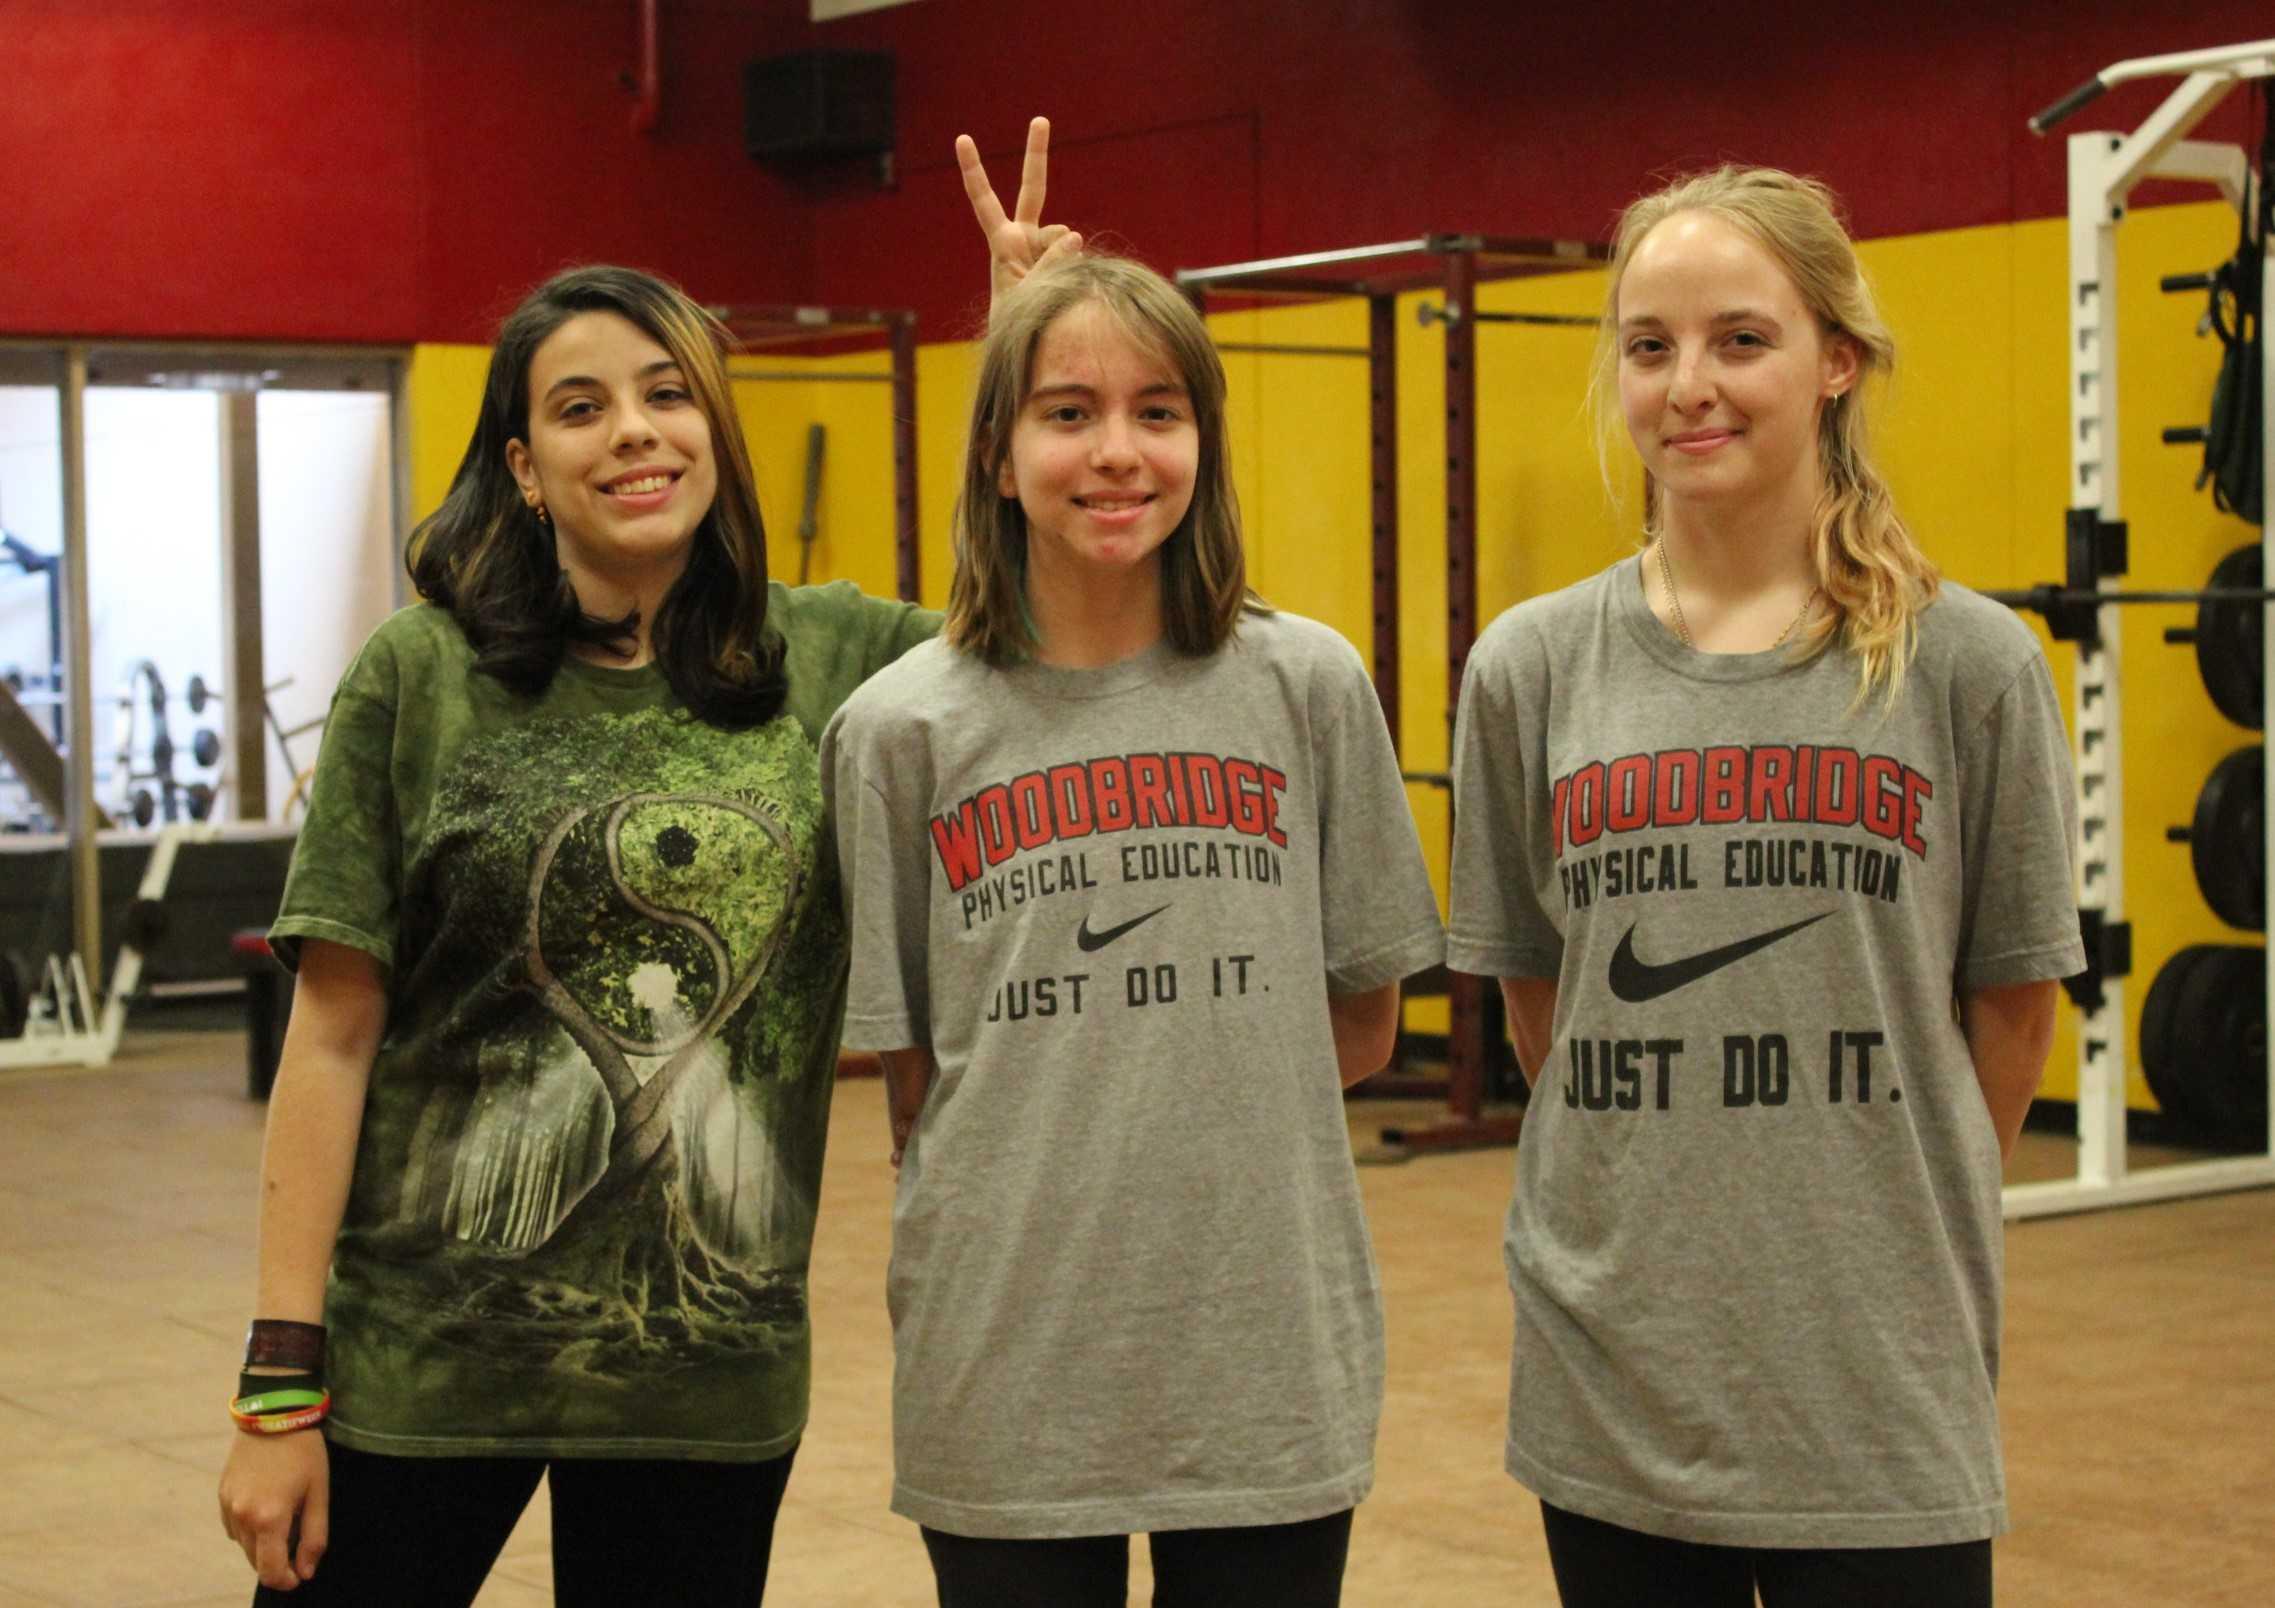 Allen (left), Hazeldine (middle), Tonini (right)